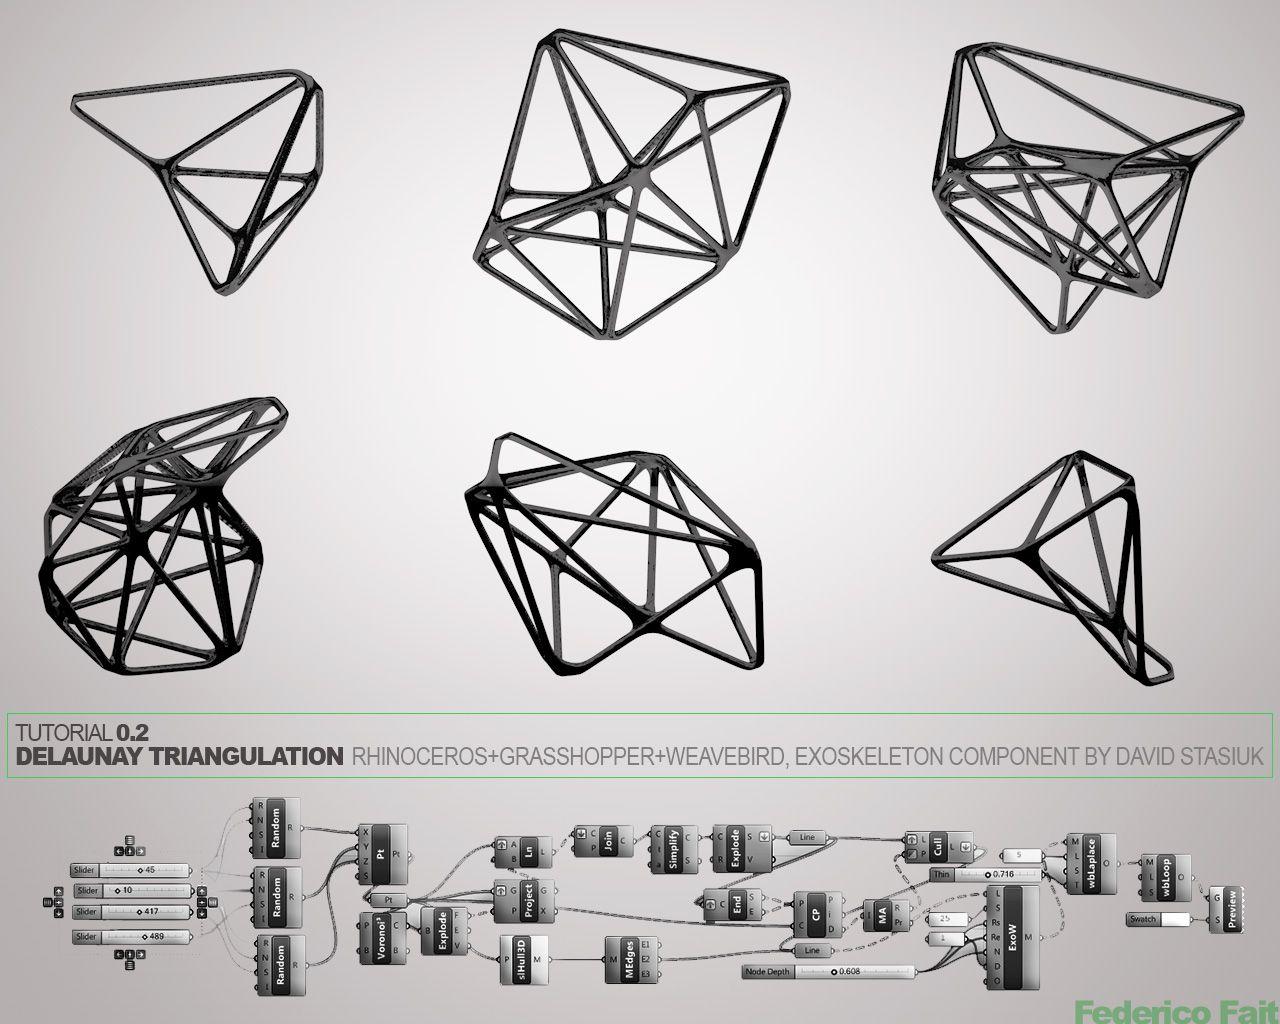 Grasshopper Tutorial: Delaunay Triangulation - Grasshopper